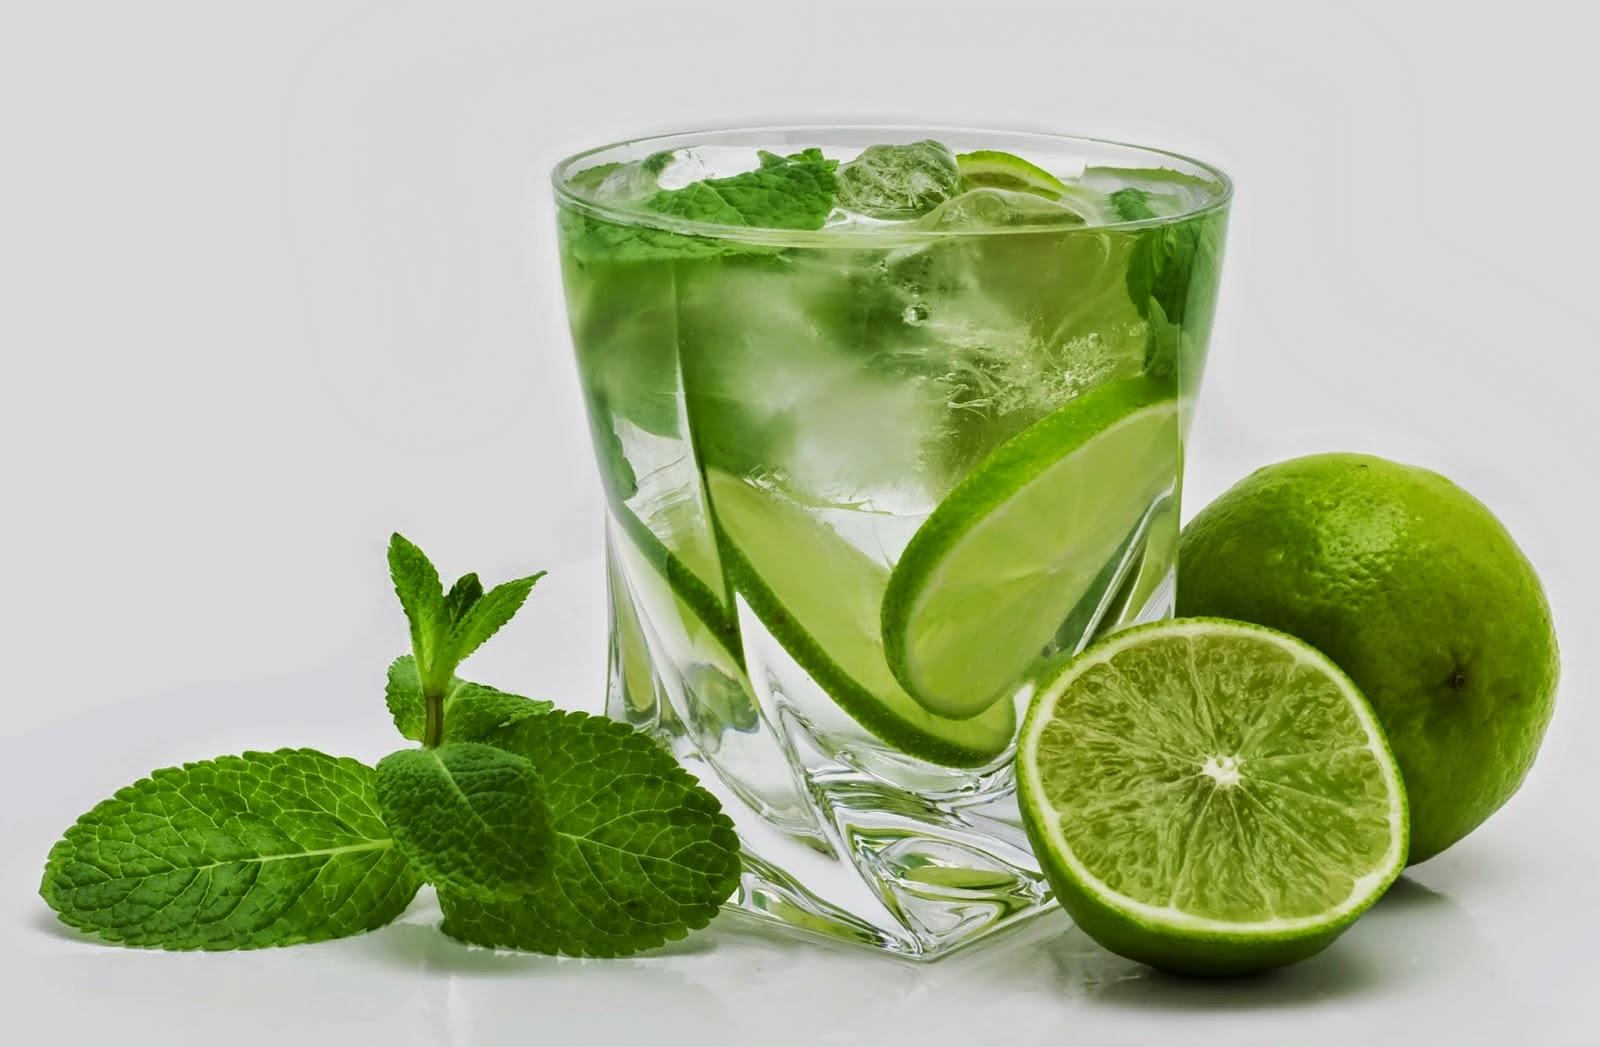 Jugo de limón + Grano Verde